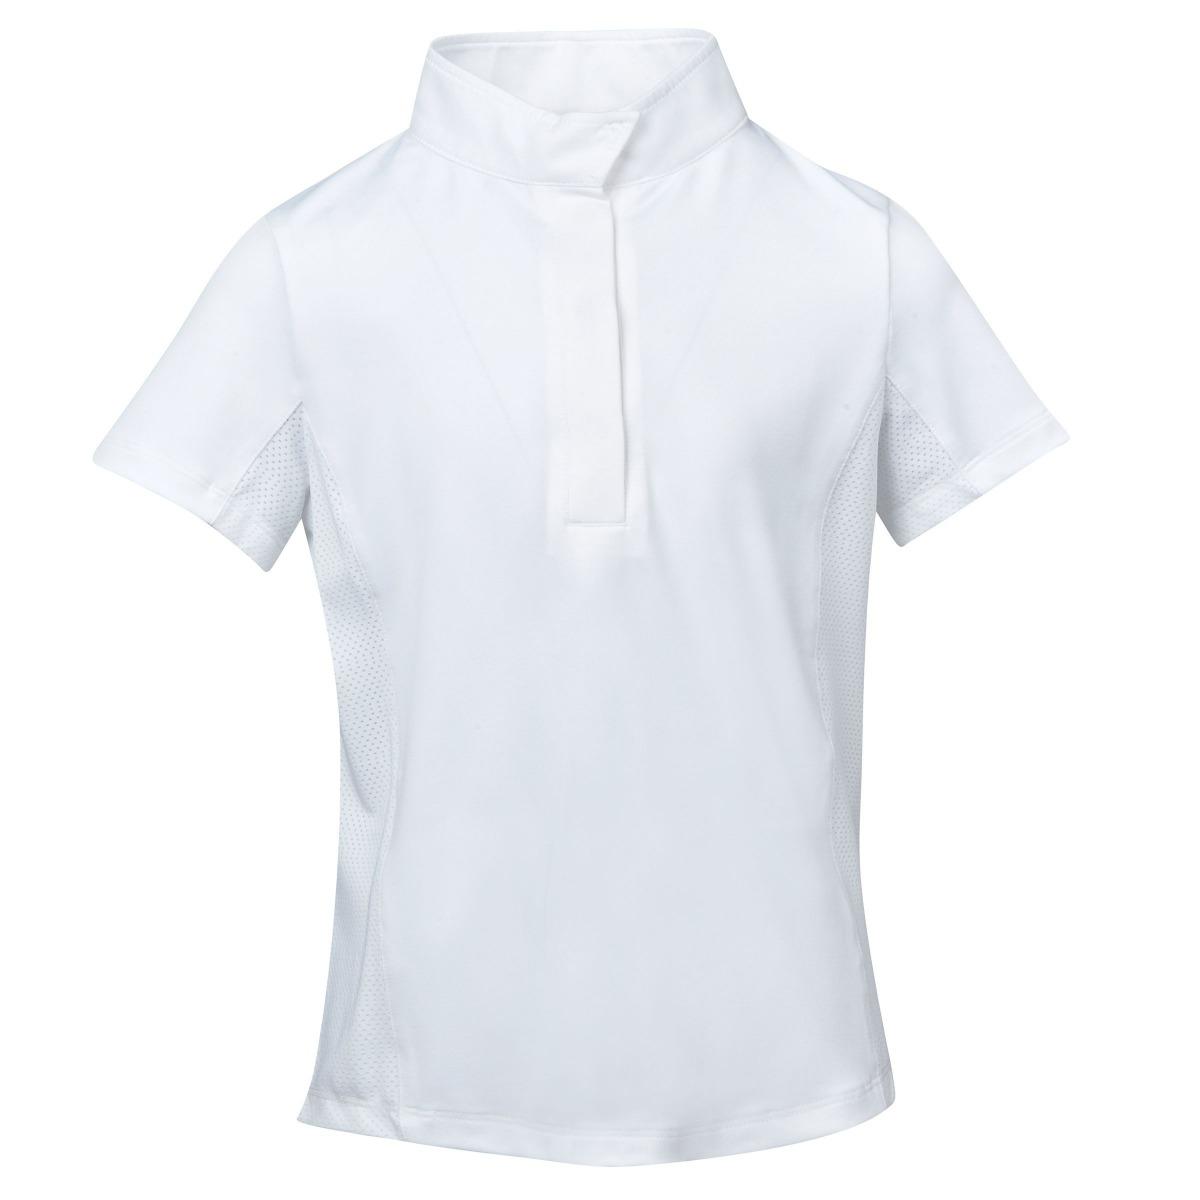 dublin ria short sleeve competition shirt